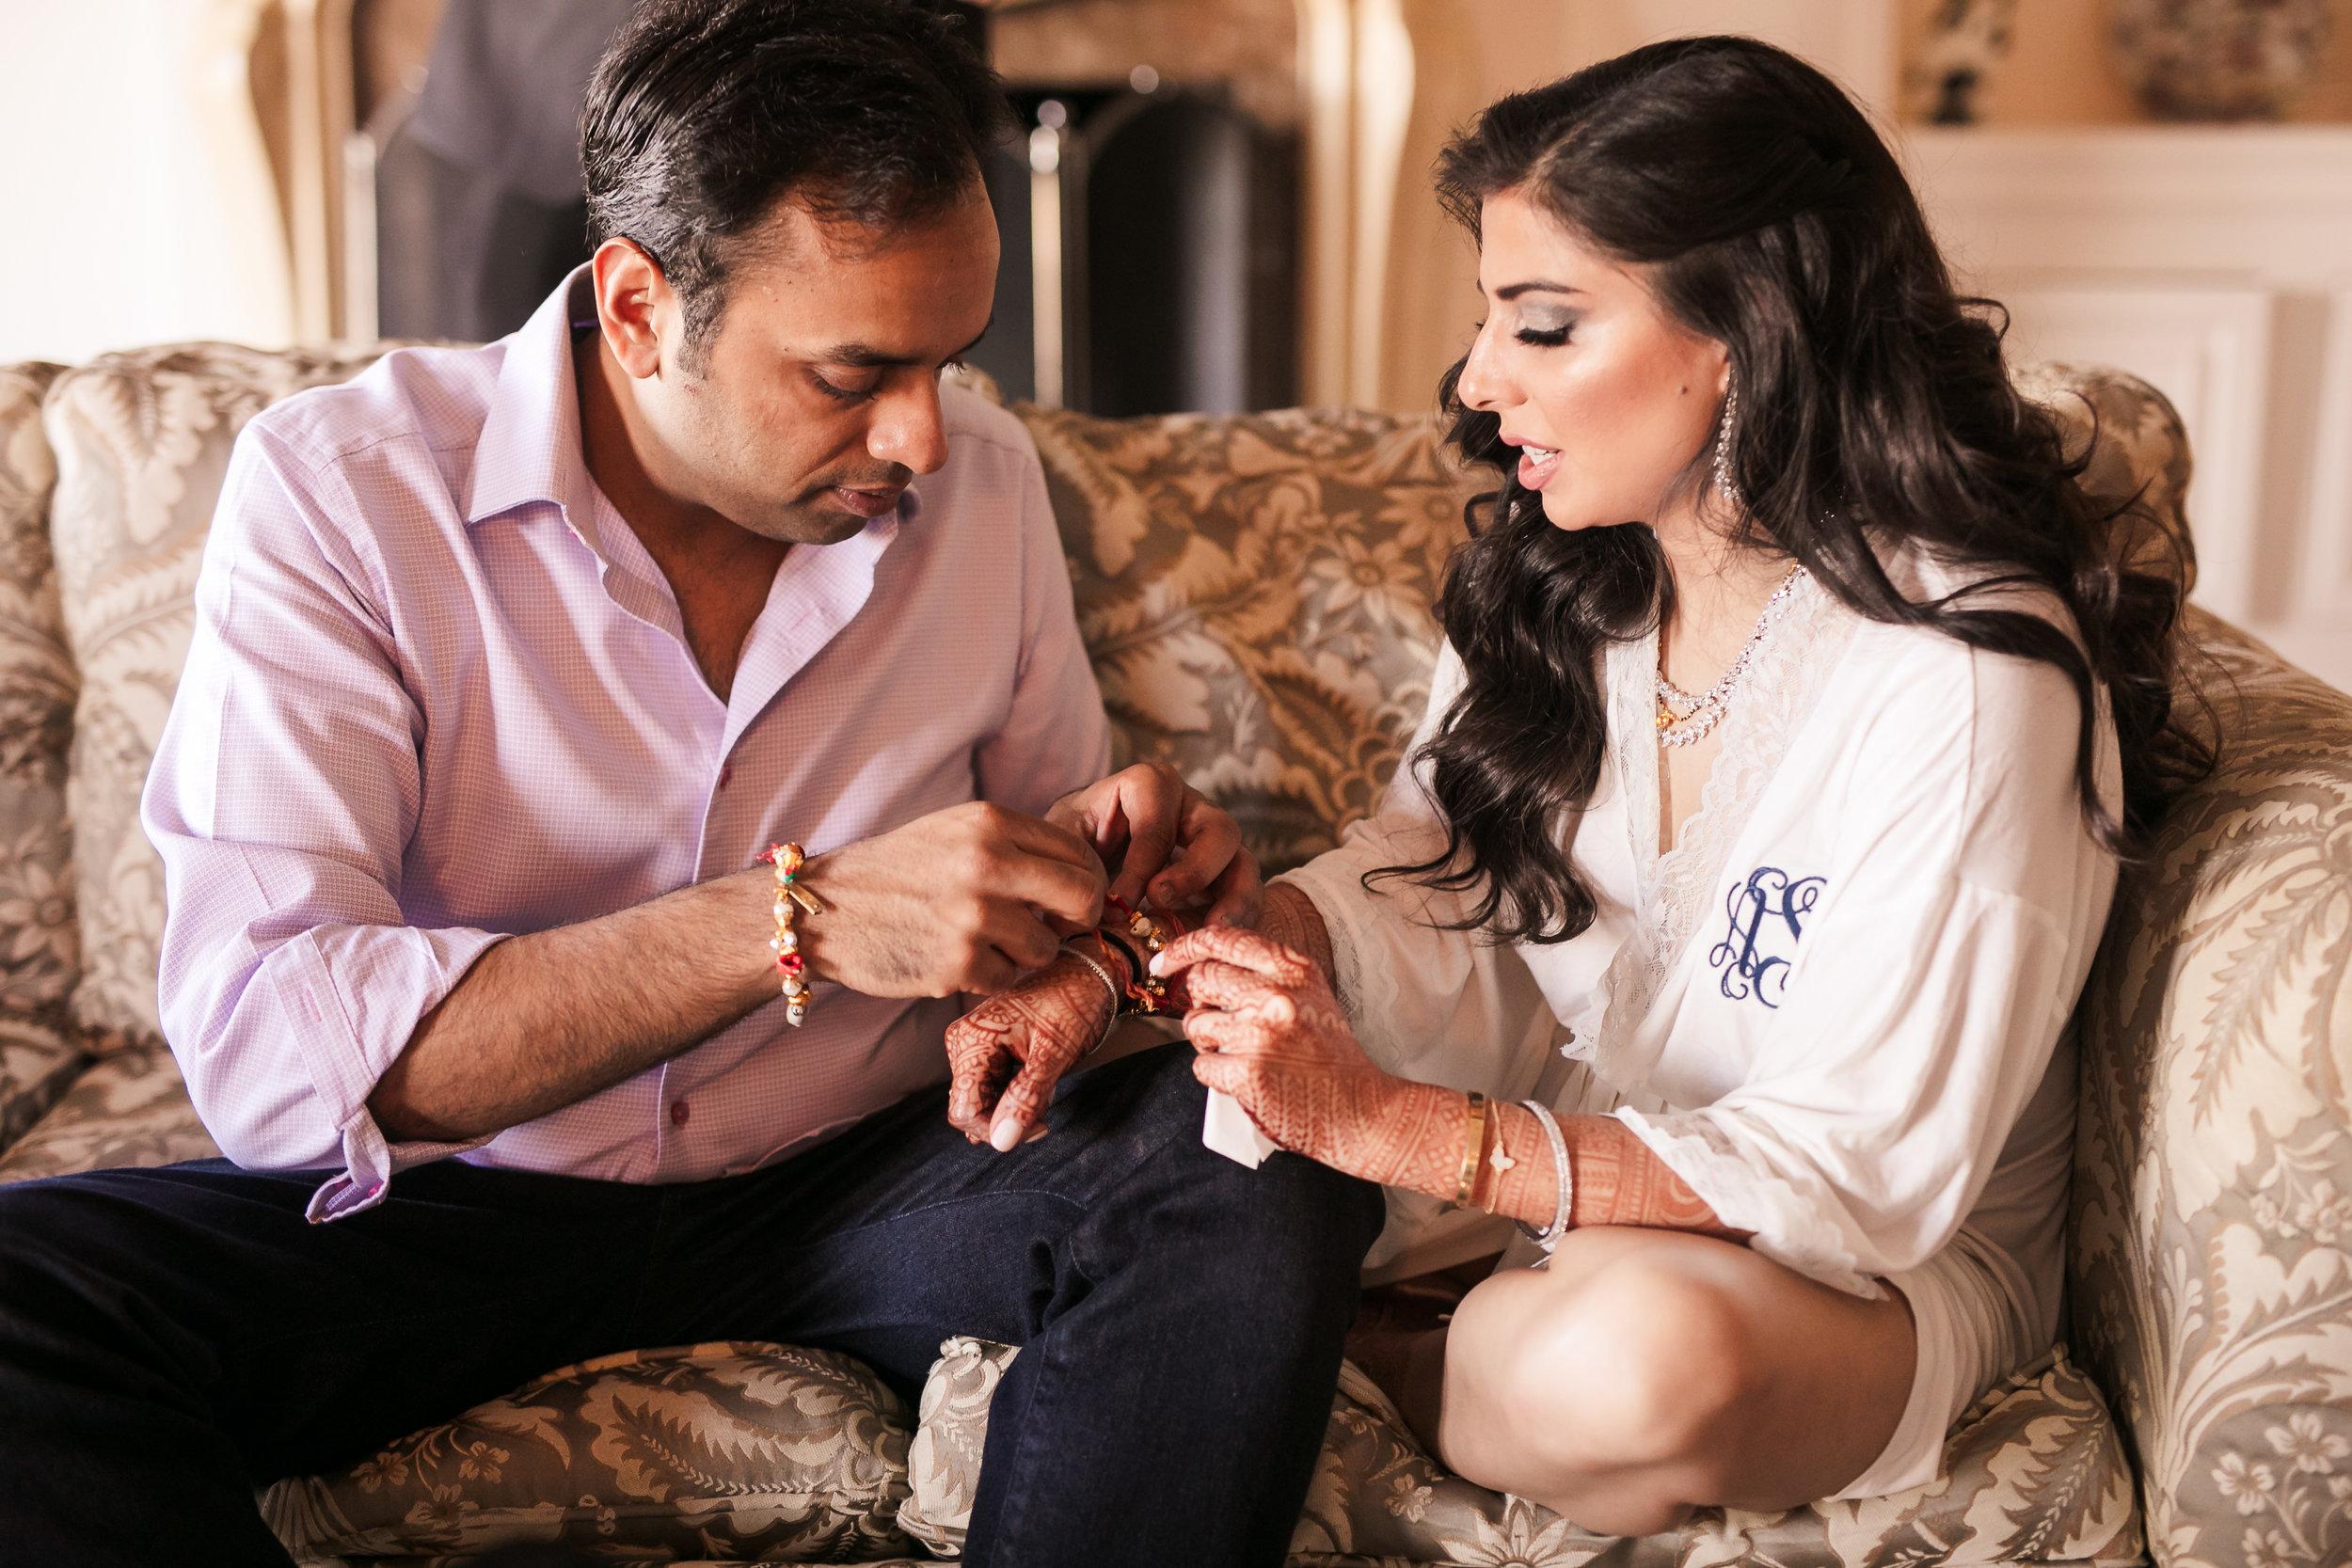 INDIAN WEDDING BRIDE AND GROOM GIFT EXCHANGING.jpg